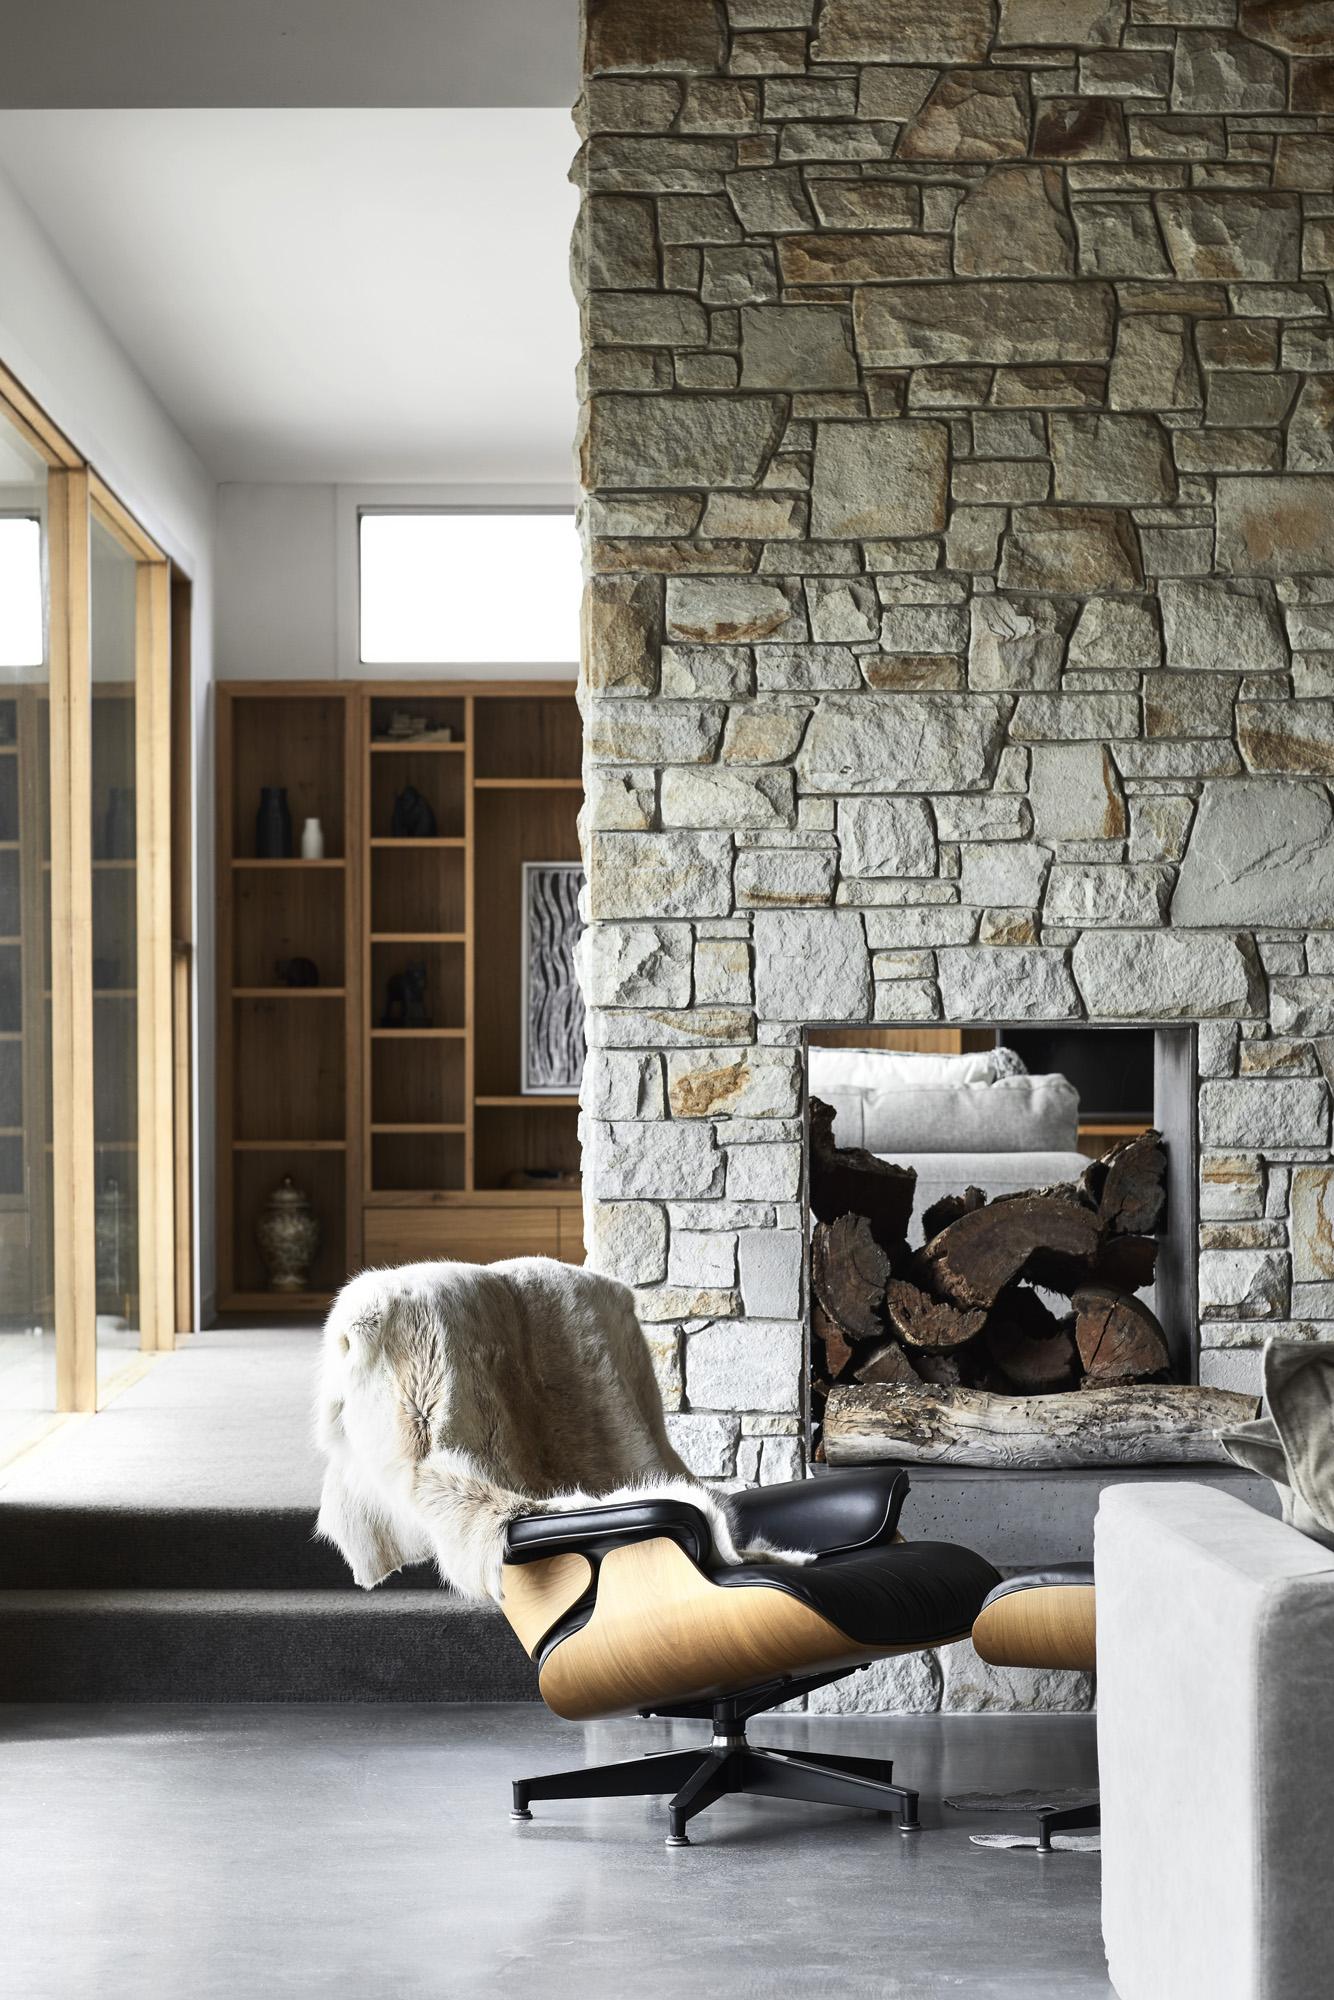 Dan Gayfer Design - MINI Australia - Feature Intervew - Australian Architecture - Ceres House, Victoria - Image 6